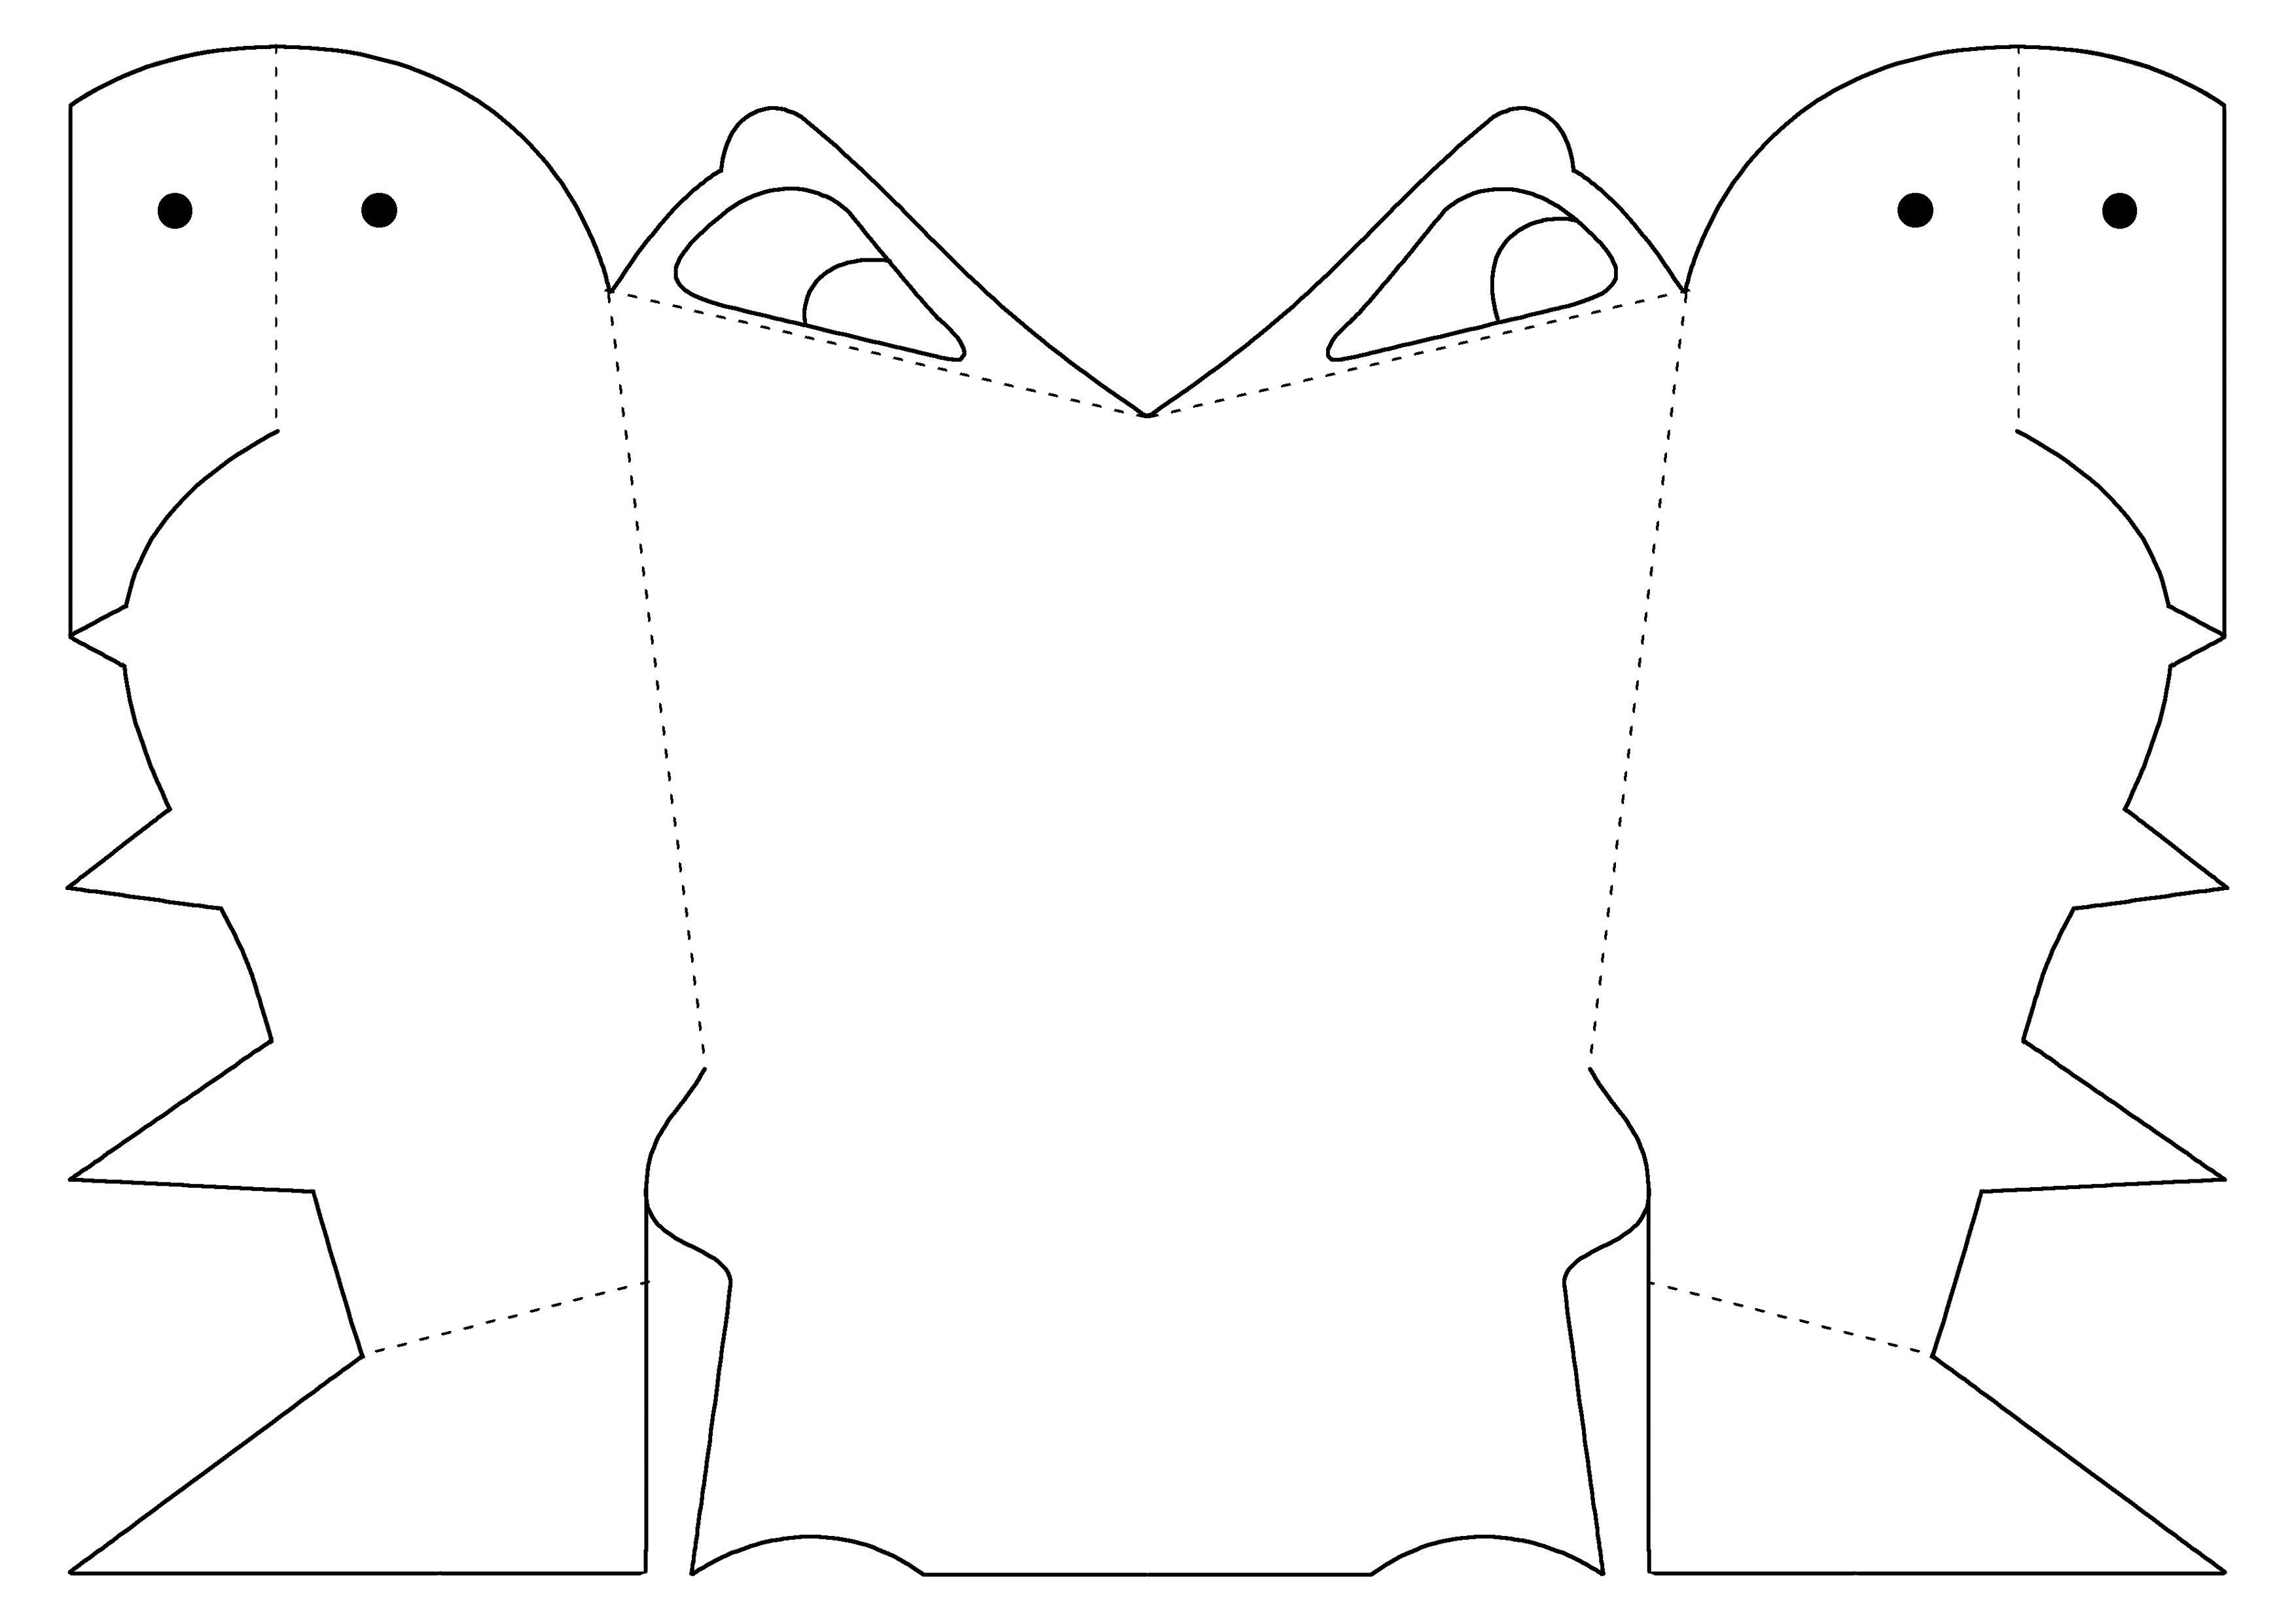 Dinosaurroar Dinosaur Roar Mask Template By Paul Stickland In Black Amp White For Children To